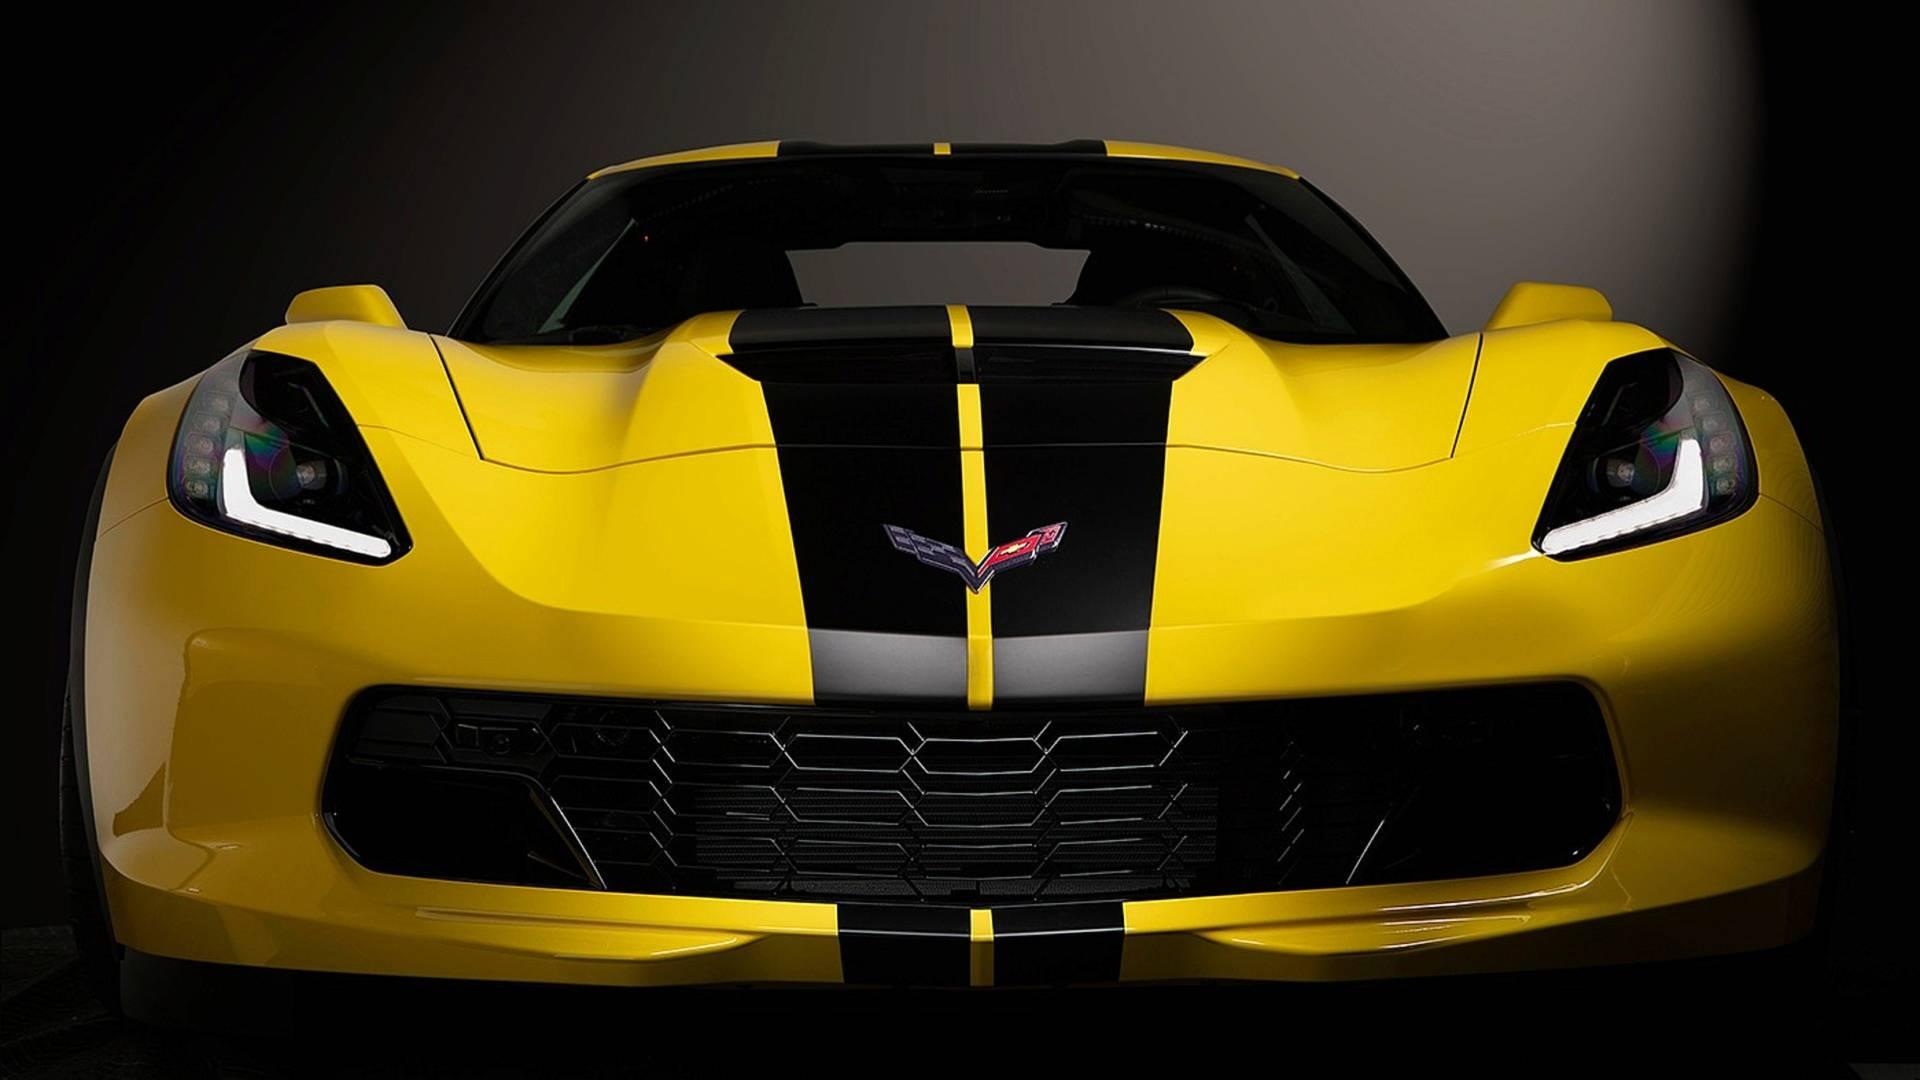 Hertz Corvette Z06 Is The Rental Racer You Ve Always Wanted